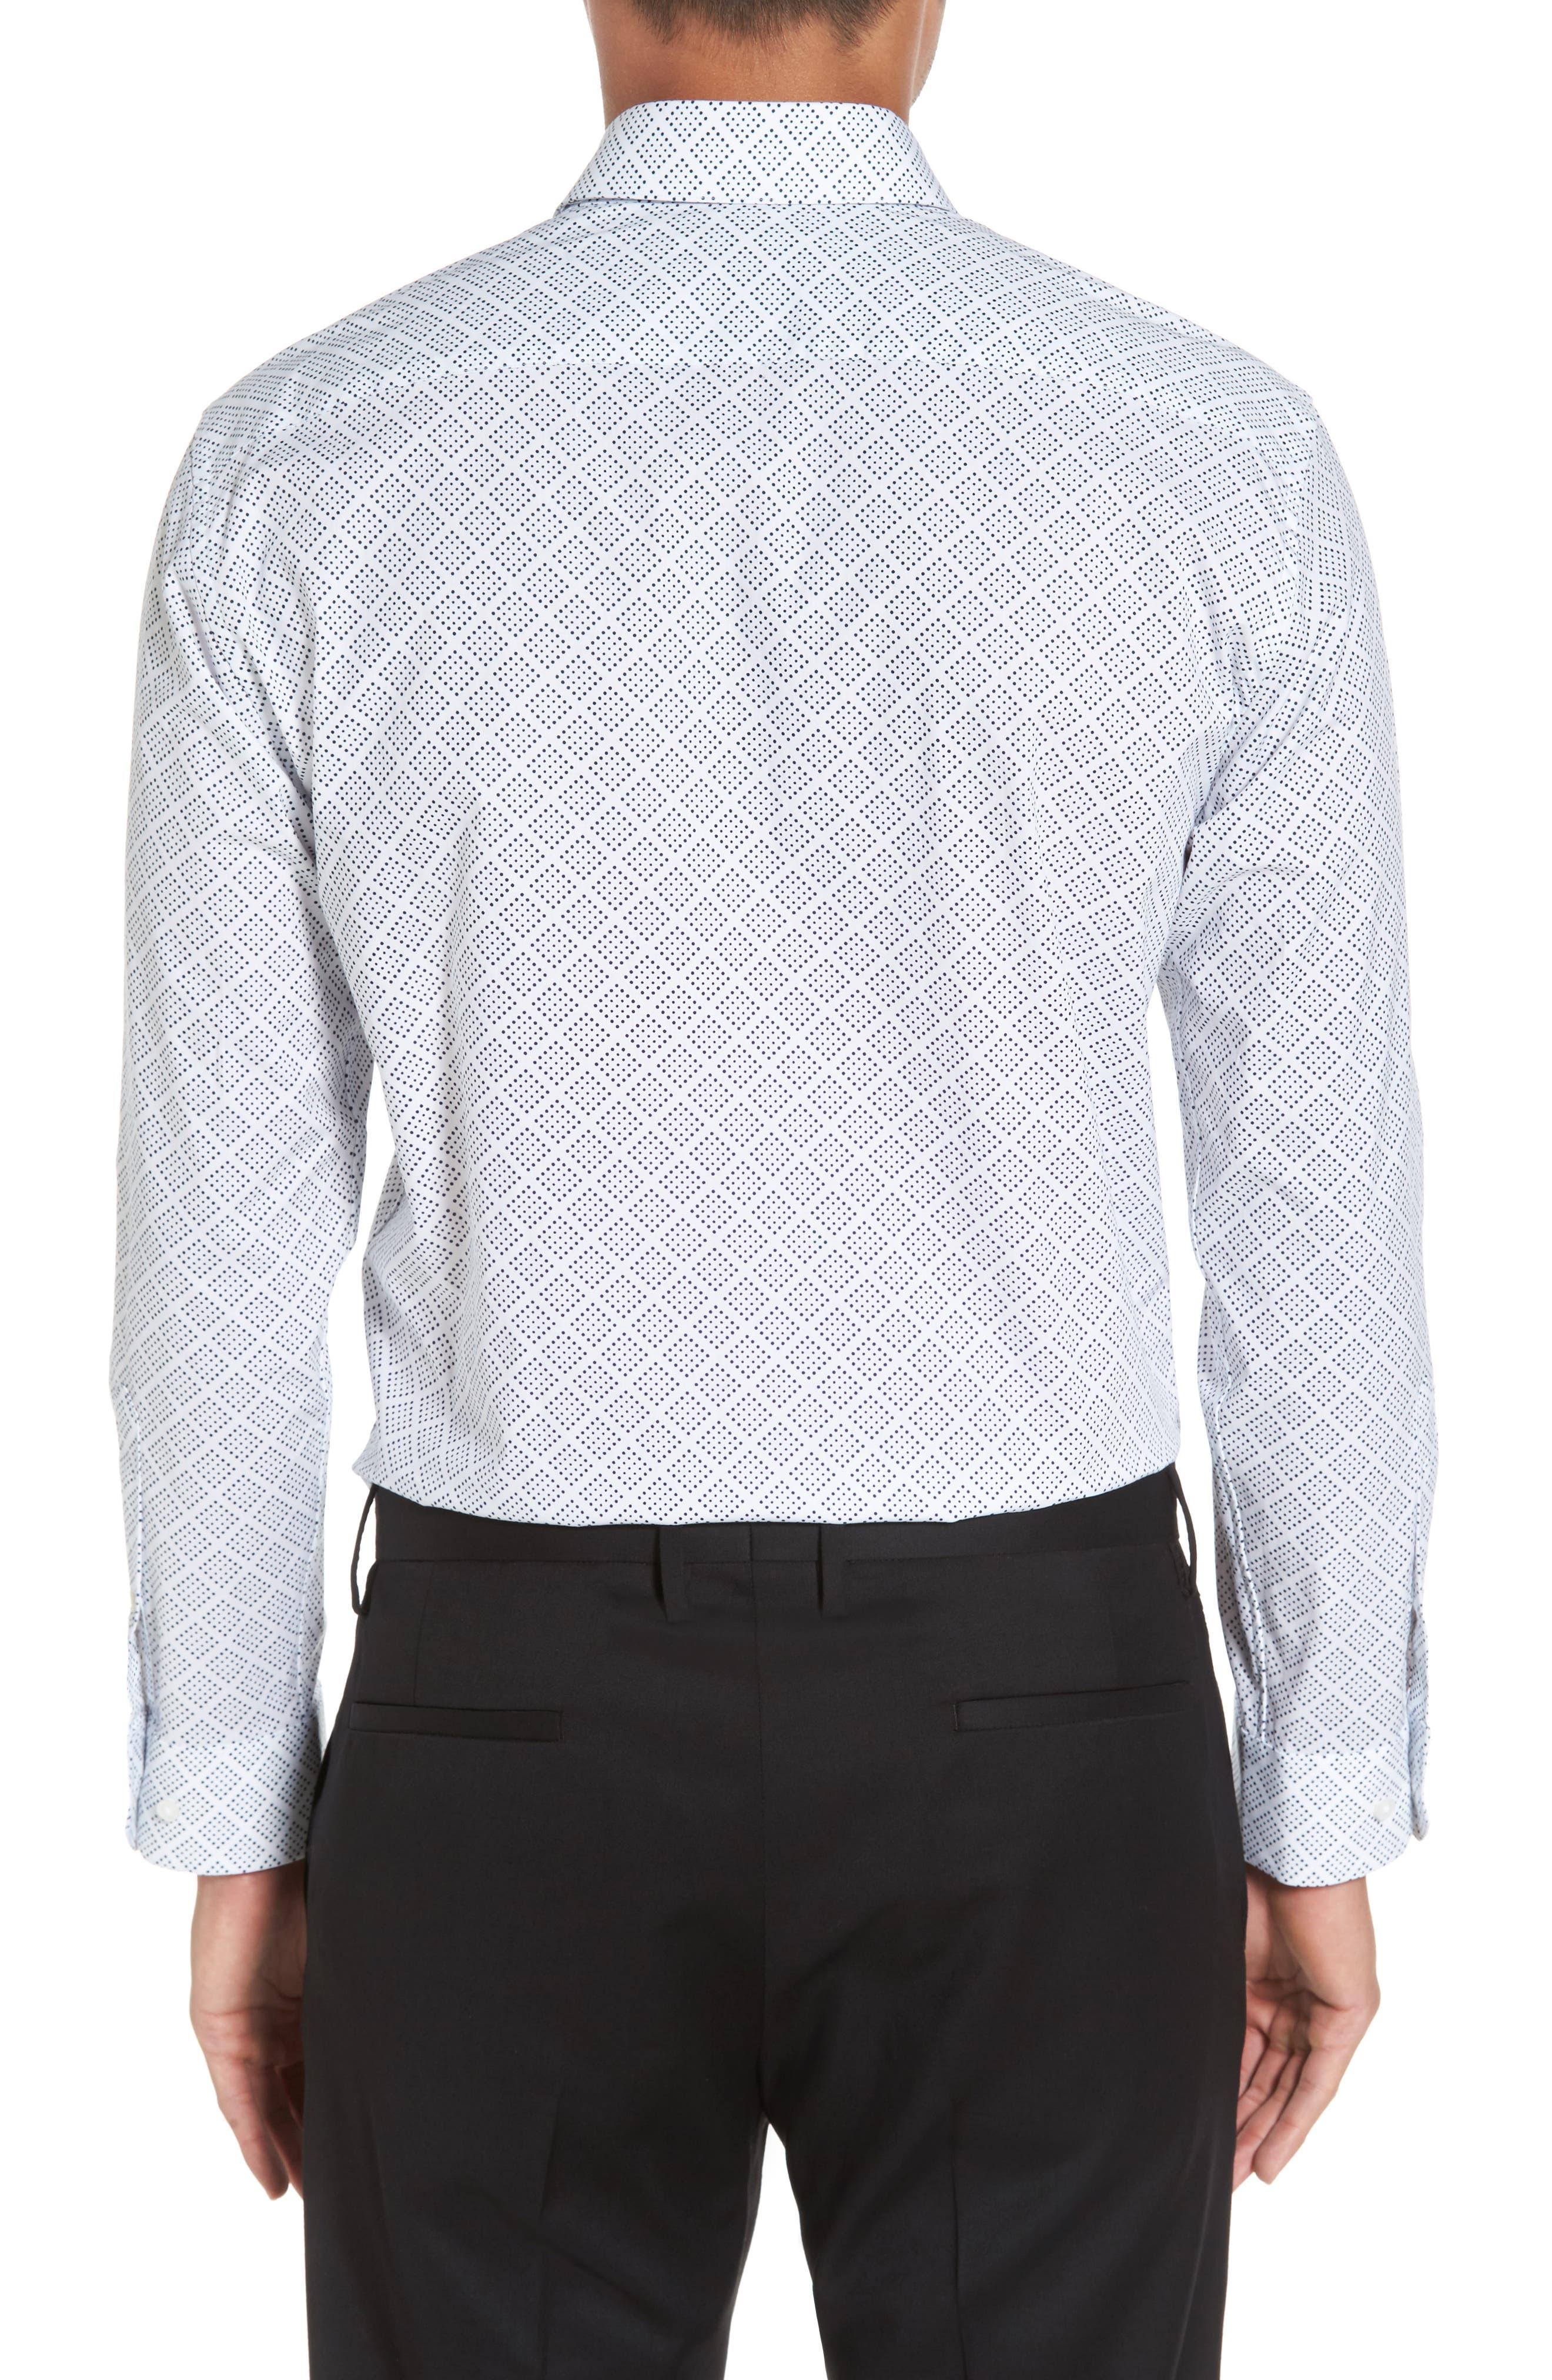 Trim Fit Non-Iron Graphic Stretch Dress Shirt,                             Alternate thumbnail 2, color,                             410